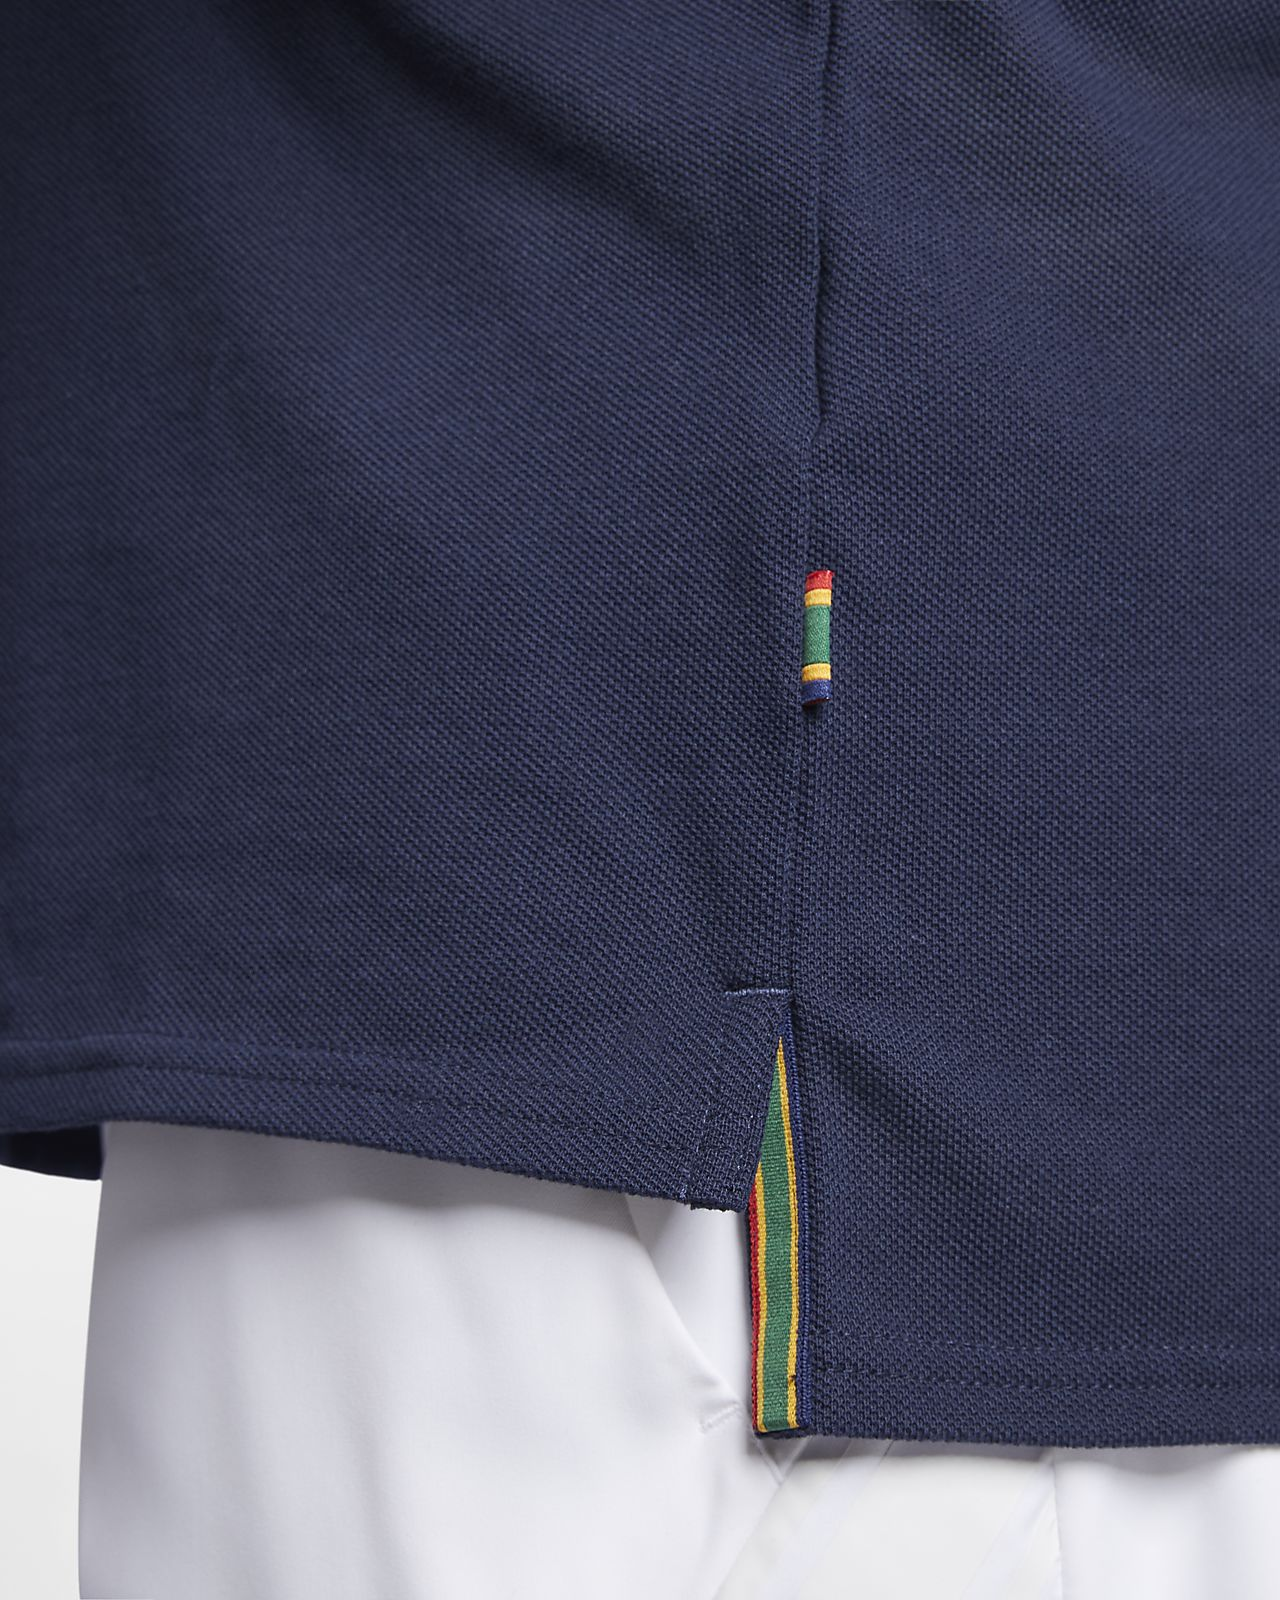 ae60c89caa4 Low Resolution NikeCourt Men s Tennis Polo NikeCourt Men s Tennis Polo